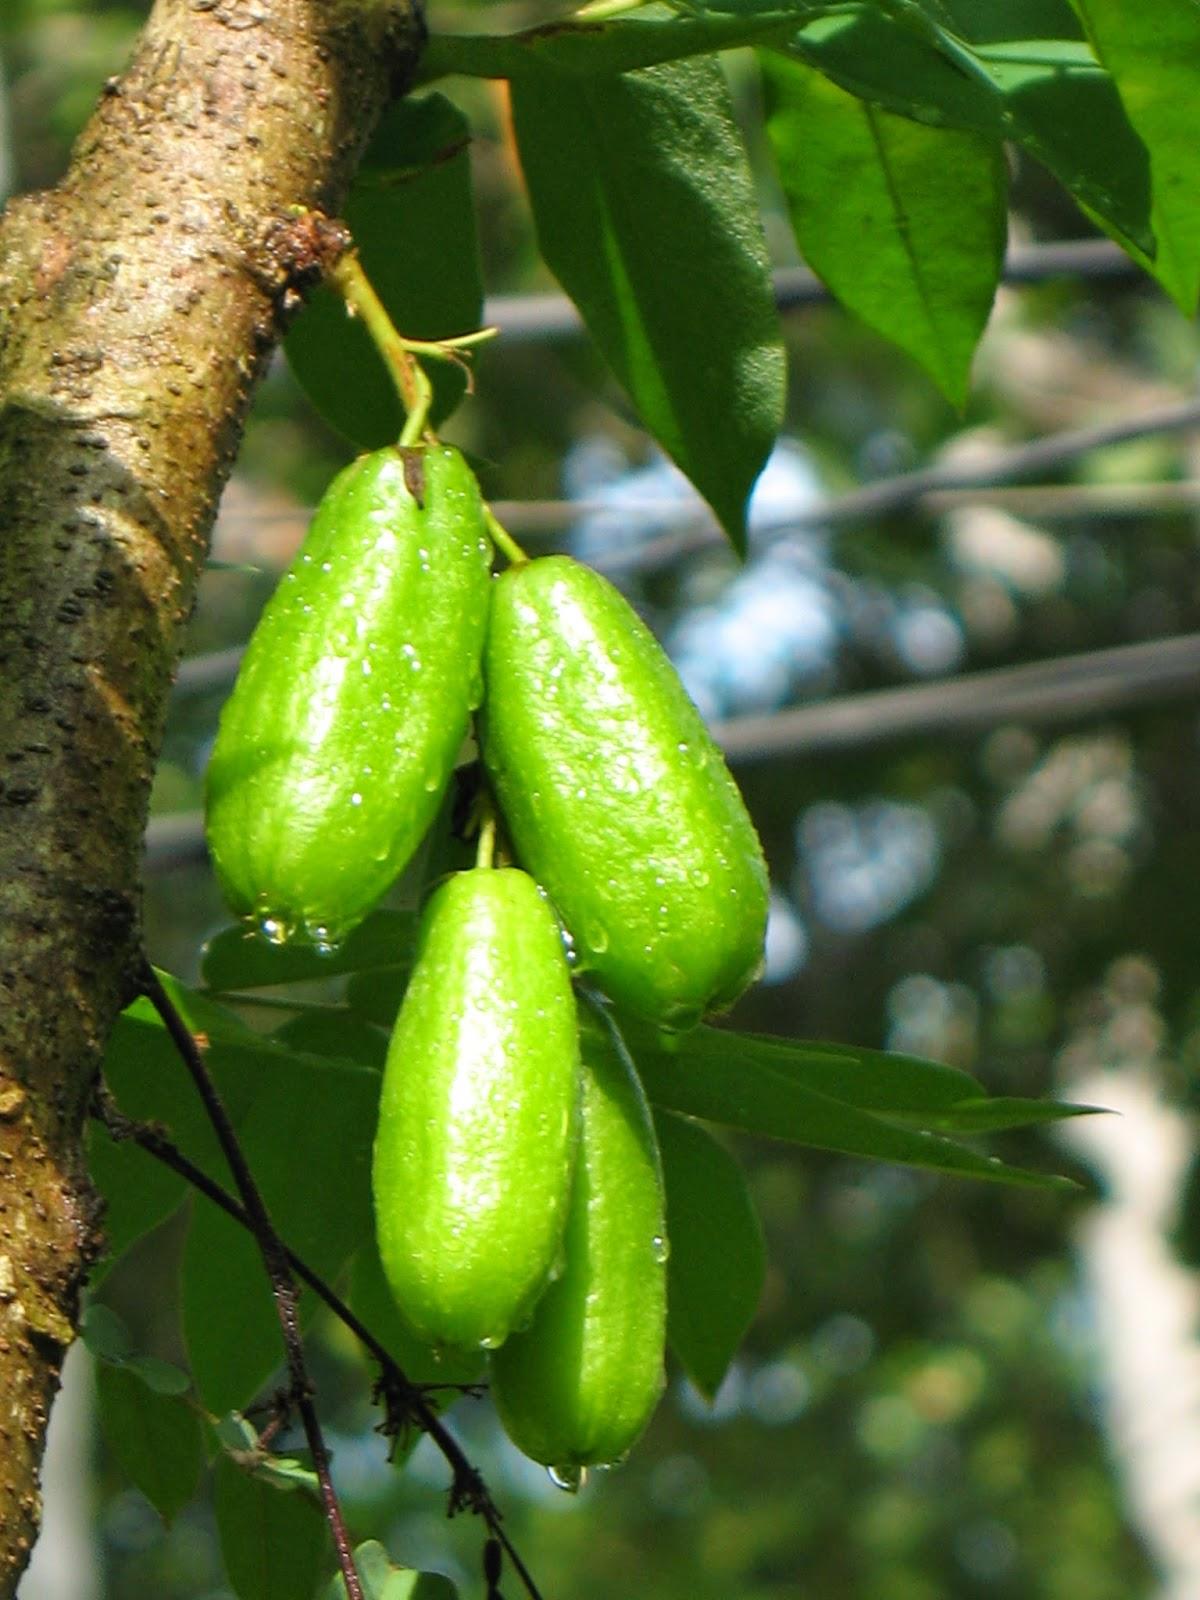 Belibing wuluh/ belimbing sayur